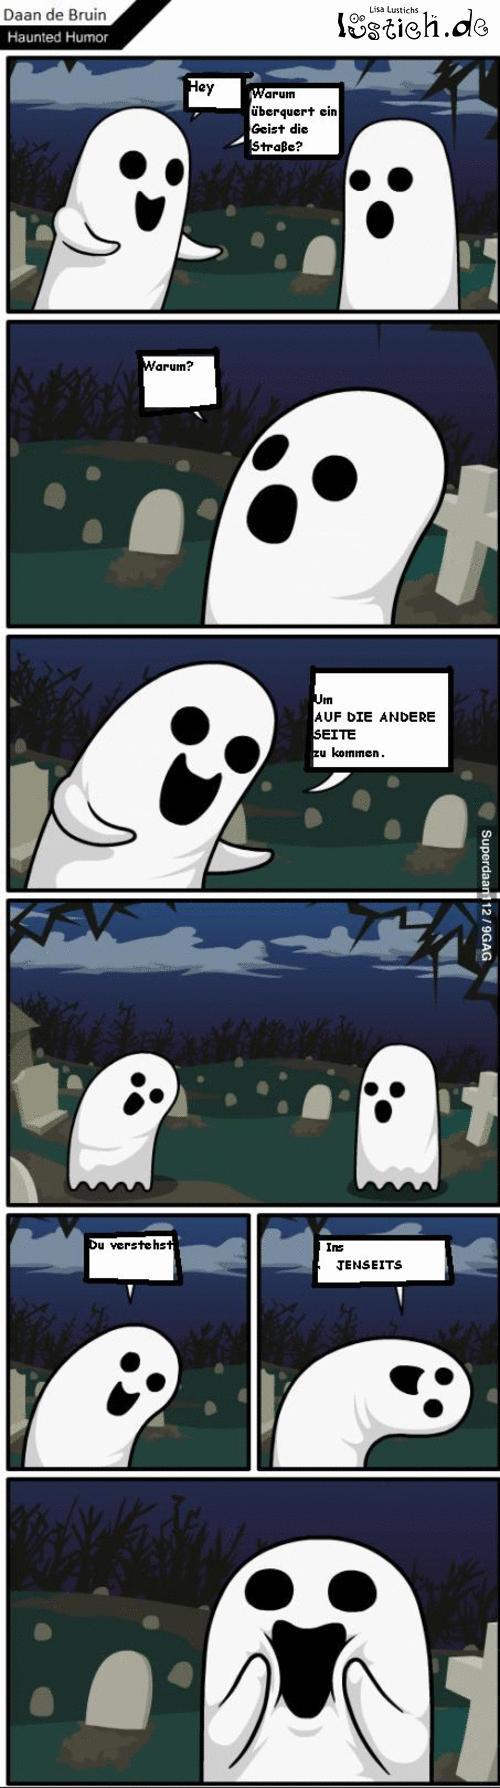 Geisterhumor